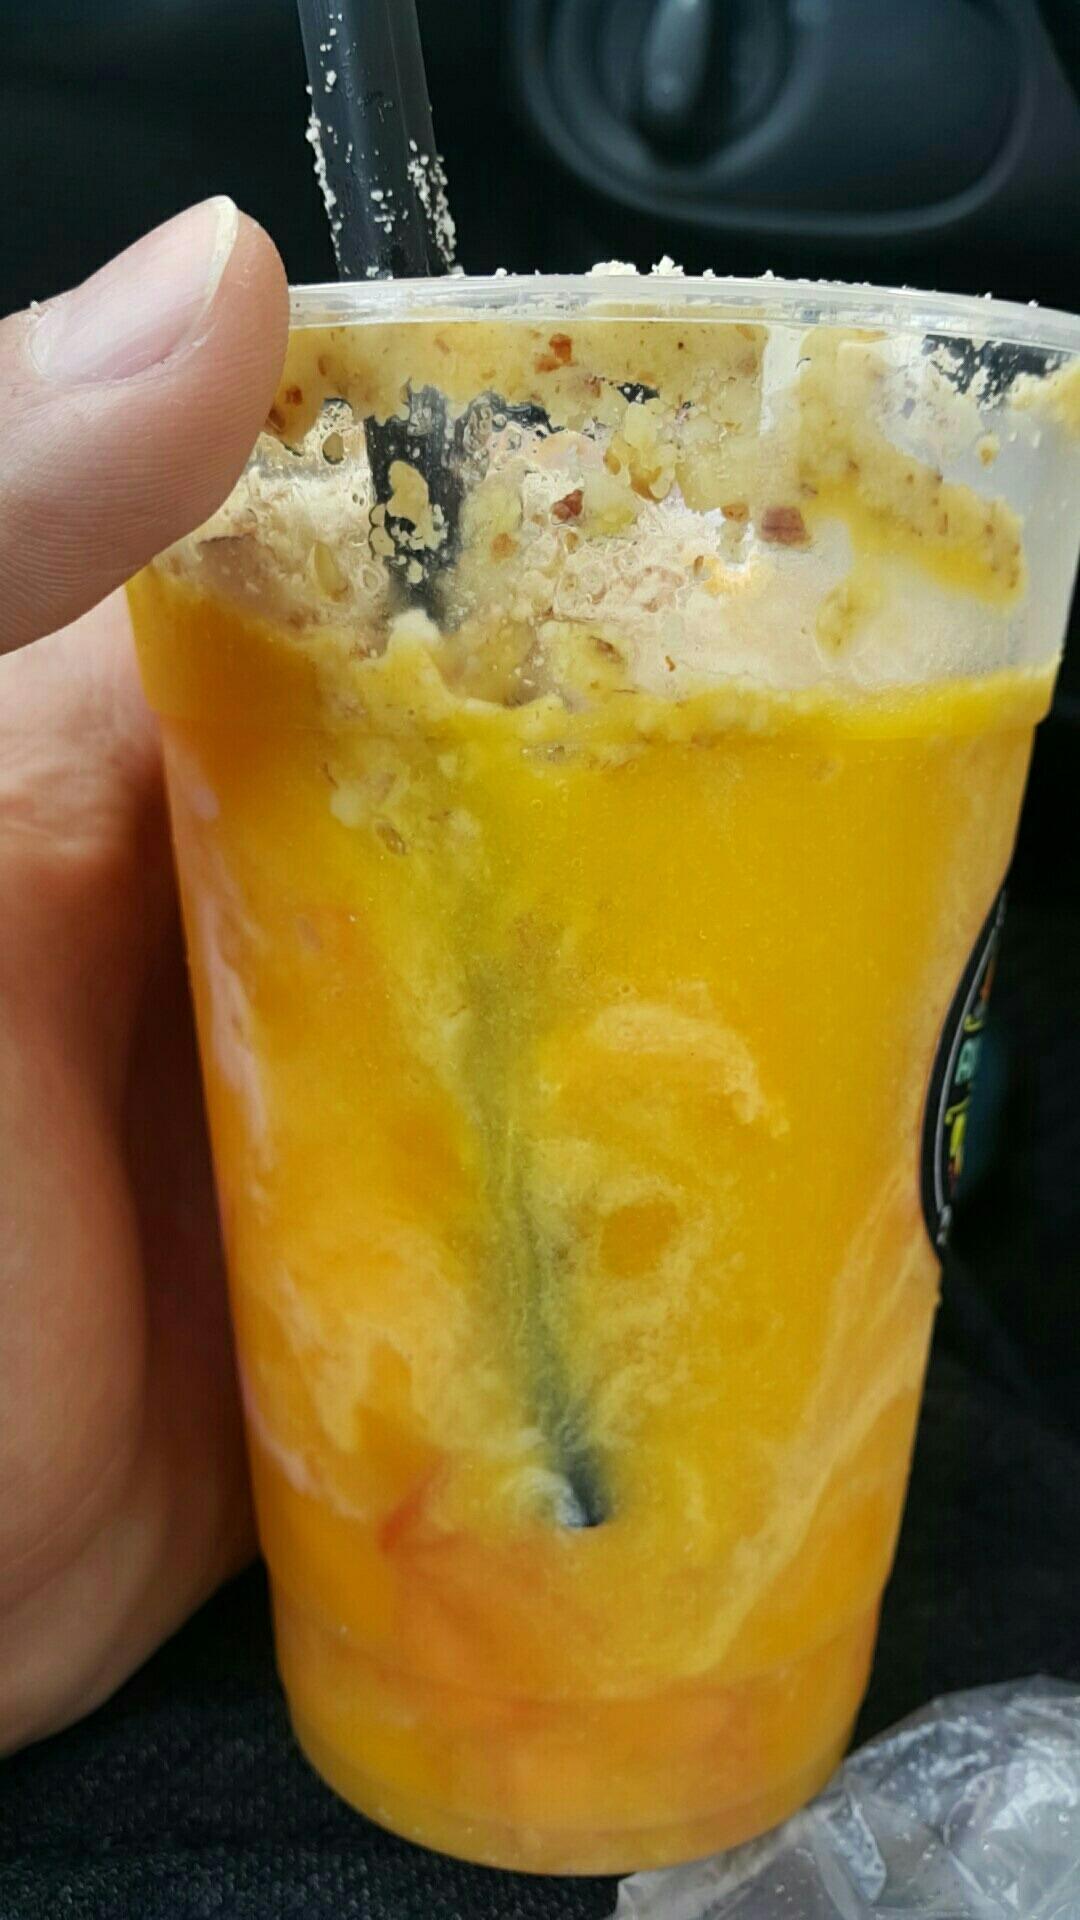 Alkawthar Fresh Juice & Sandwiches - Bahrain